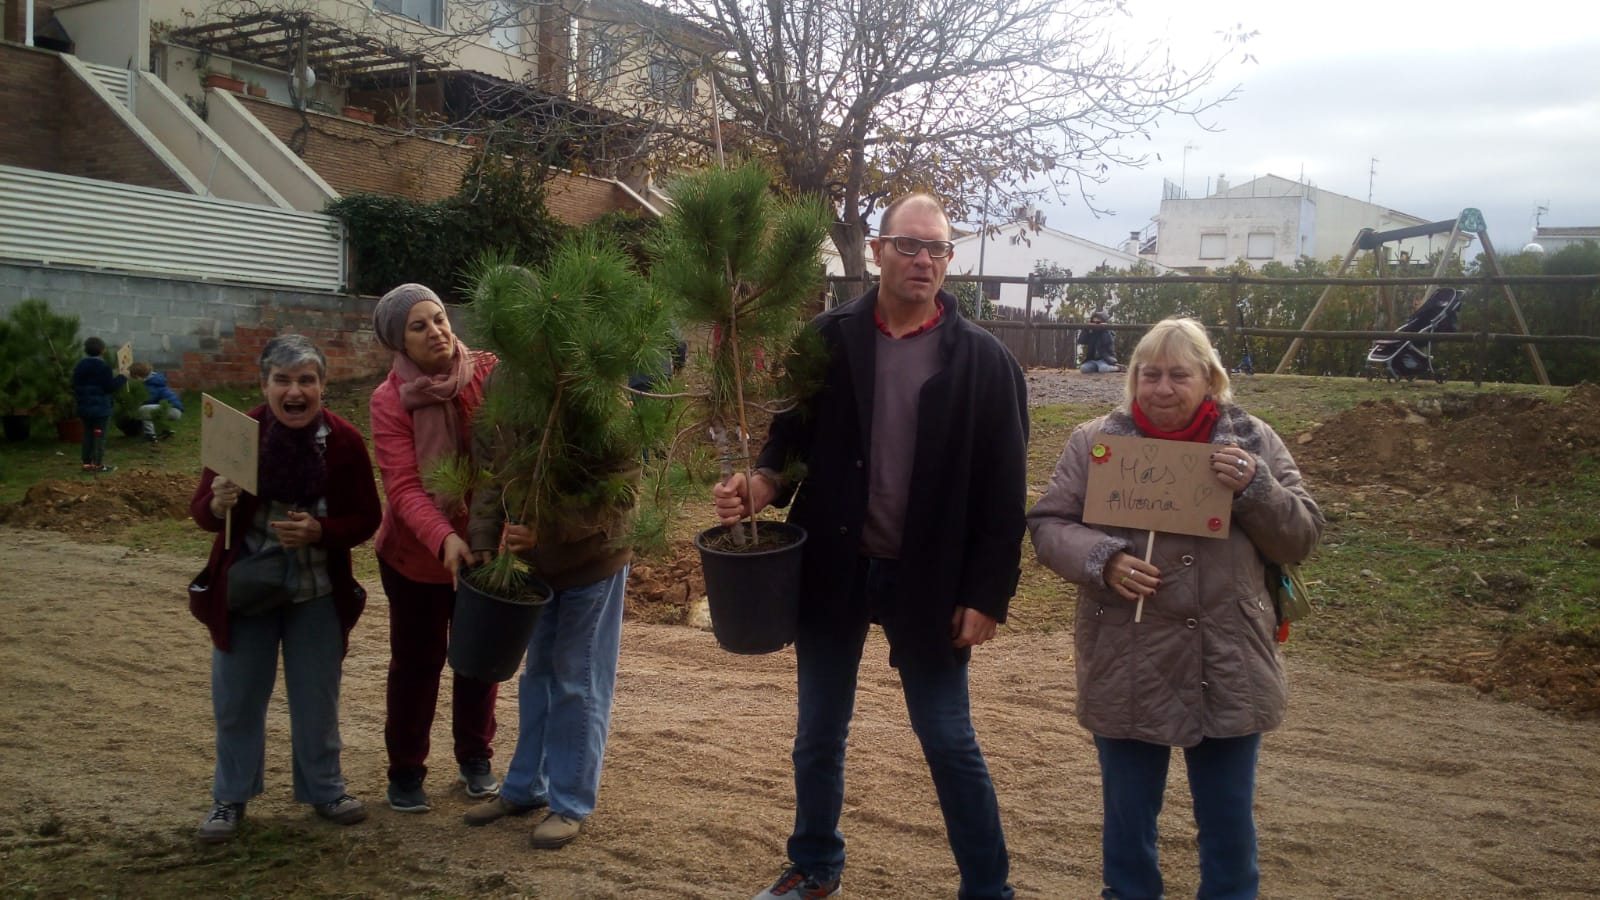 Plantem arbres a les Cabanyes